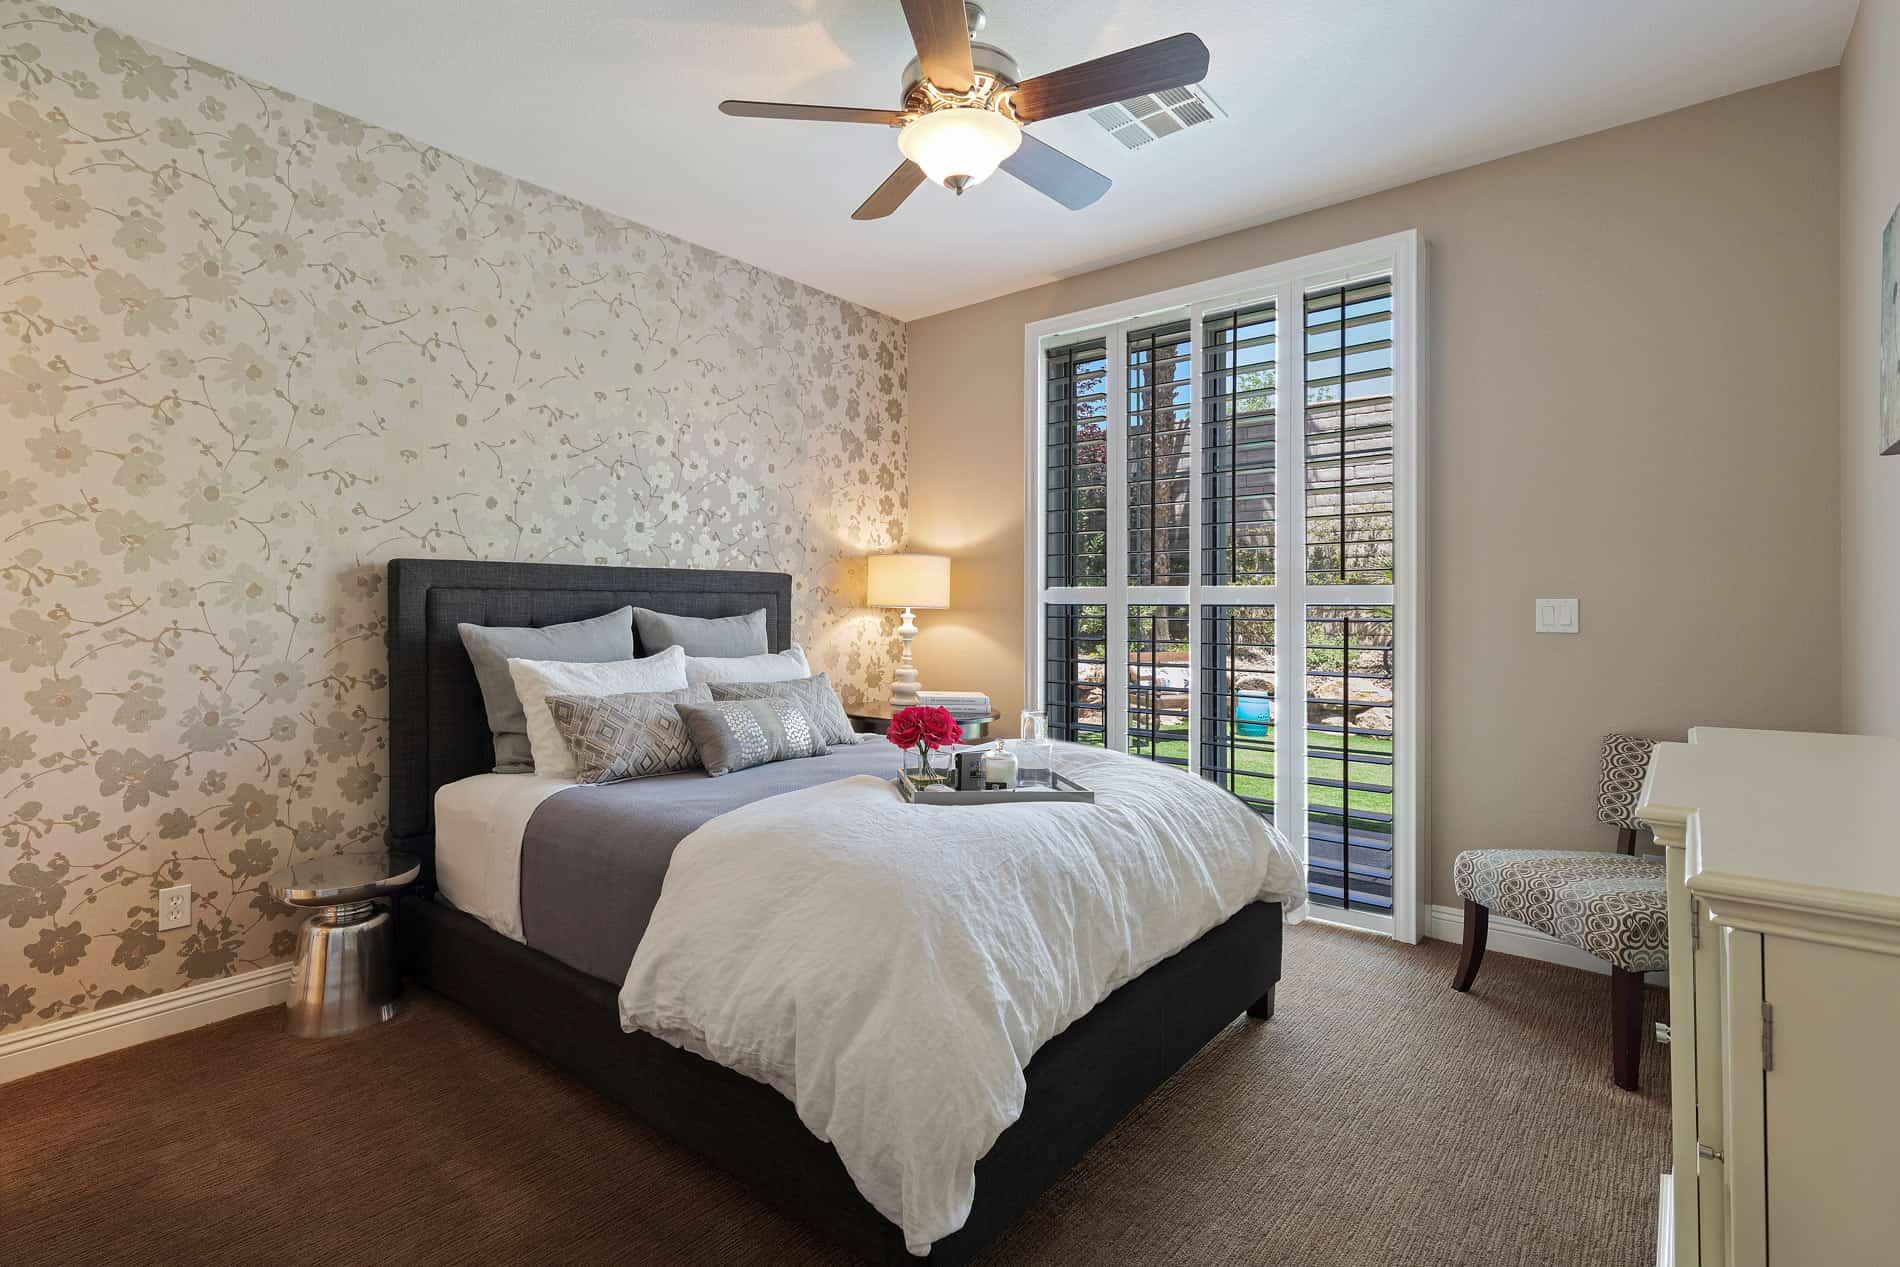 las-vegas-luxry-real-estate-realtor-rob-jensen-company-12108-vista-linda-avenue-the-paseos033